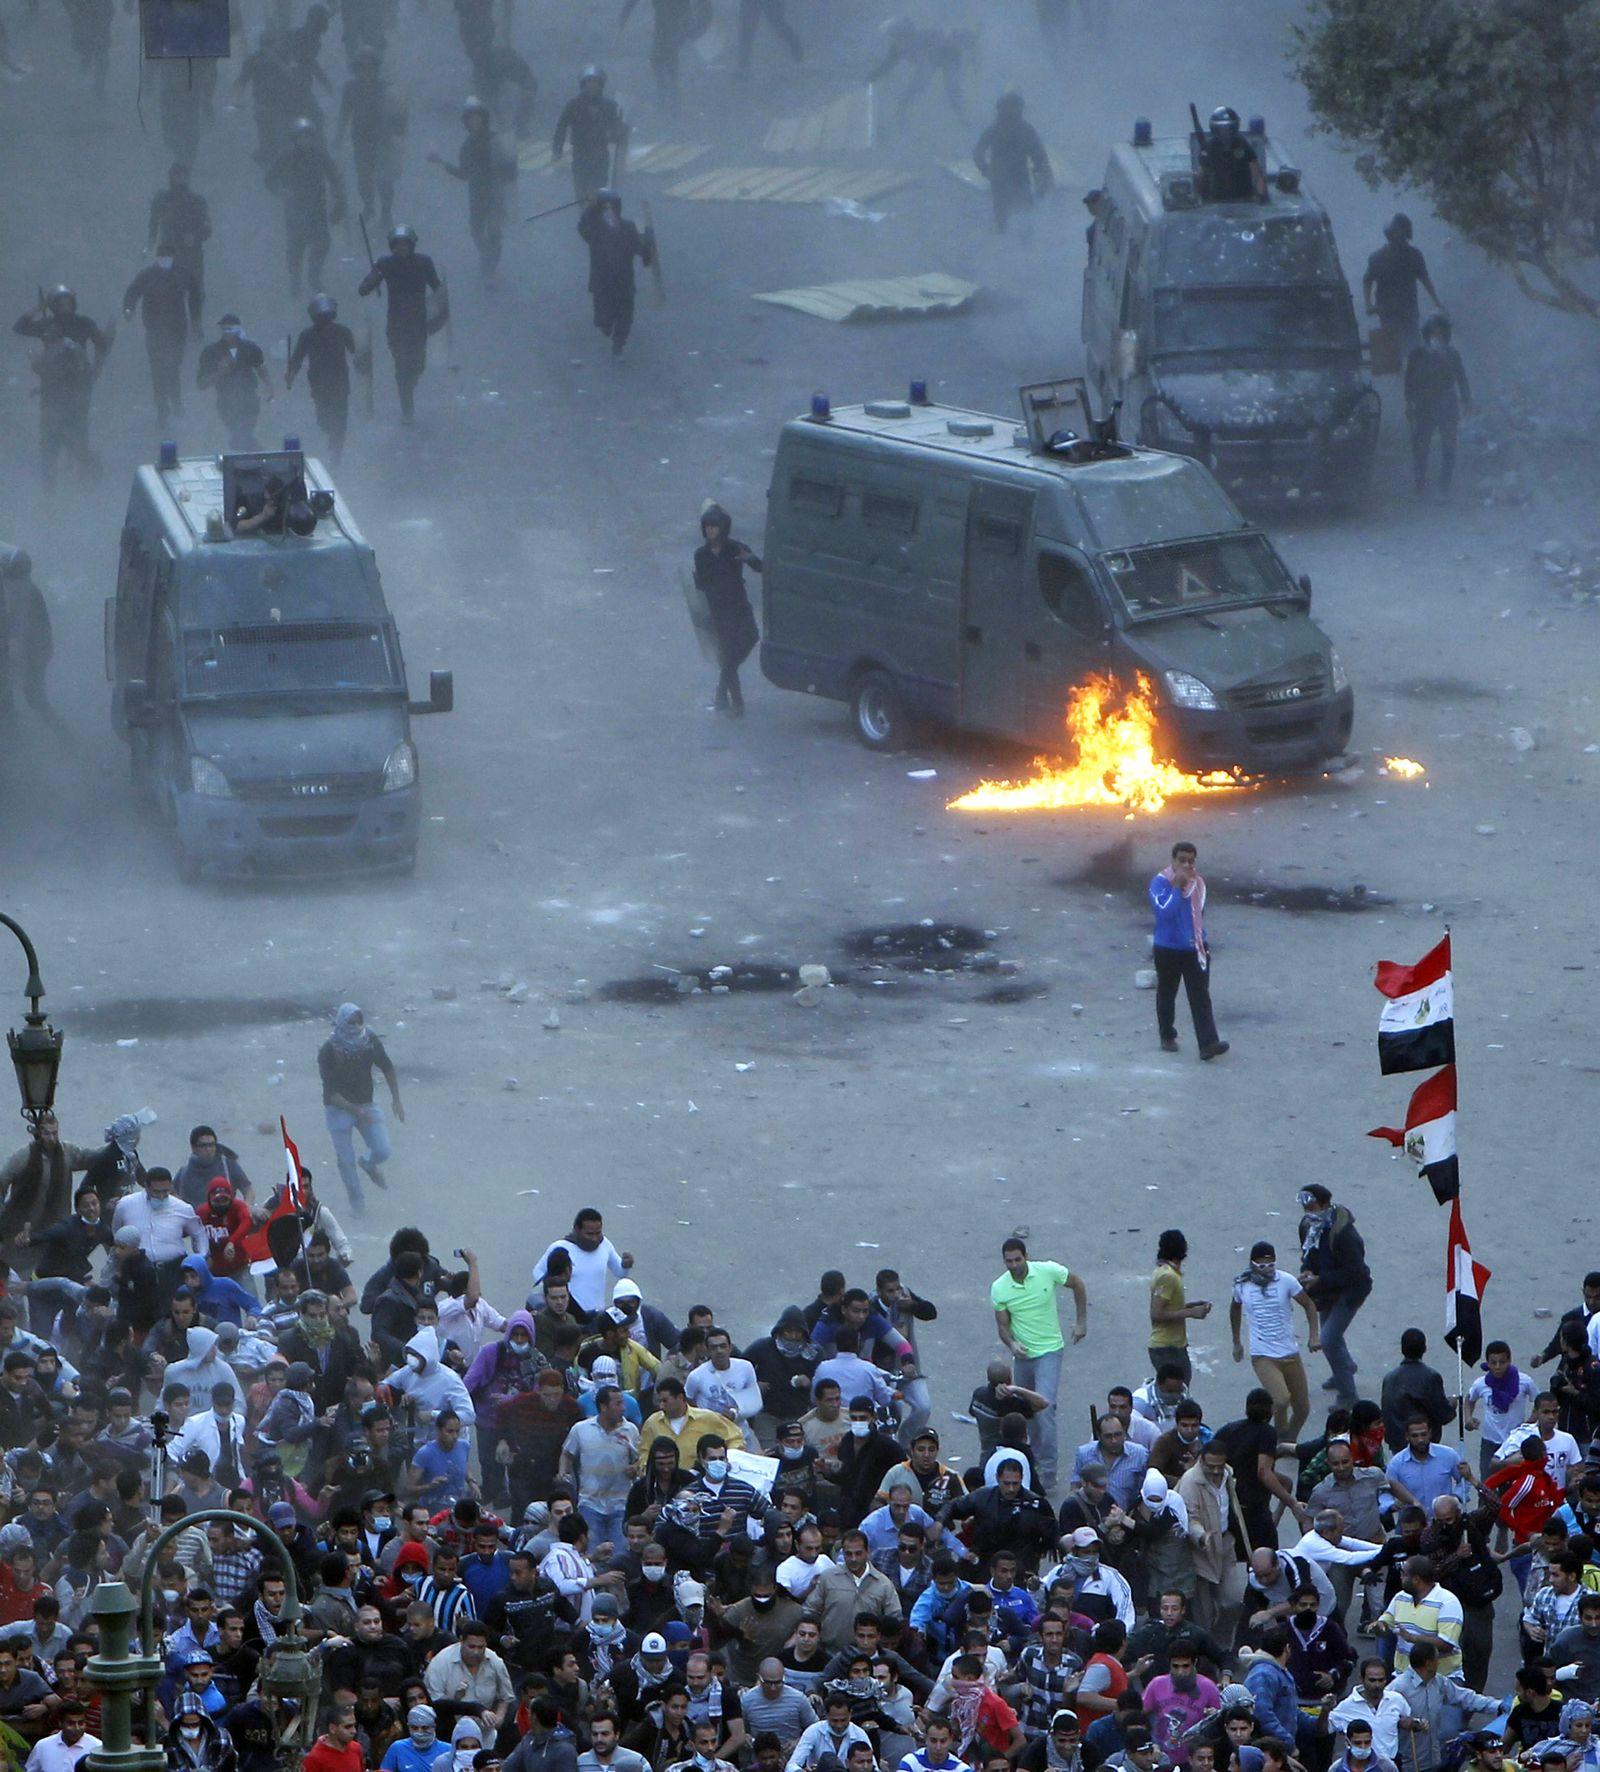 DER SPIEGEL 48/2012 SPIN 102pp / Ägypten / Tahrir Platz November